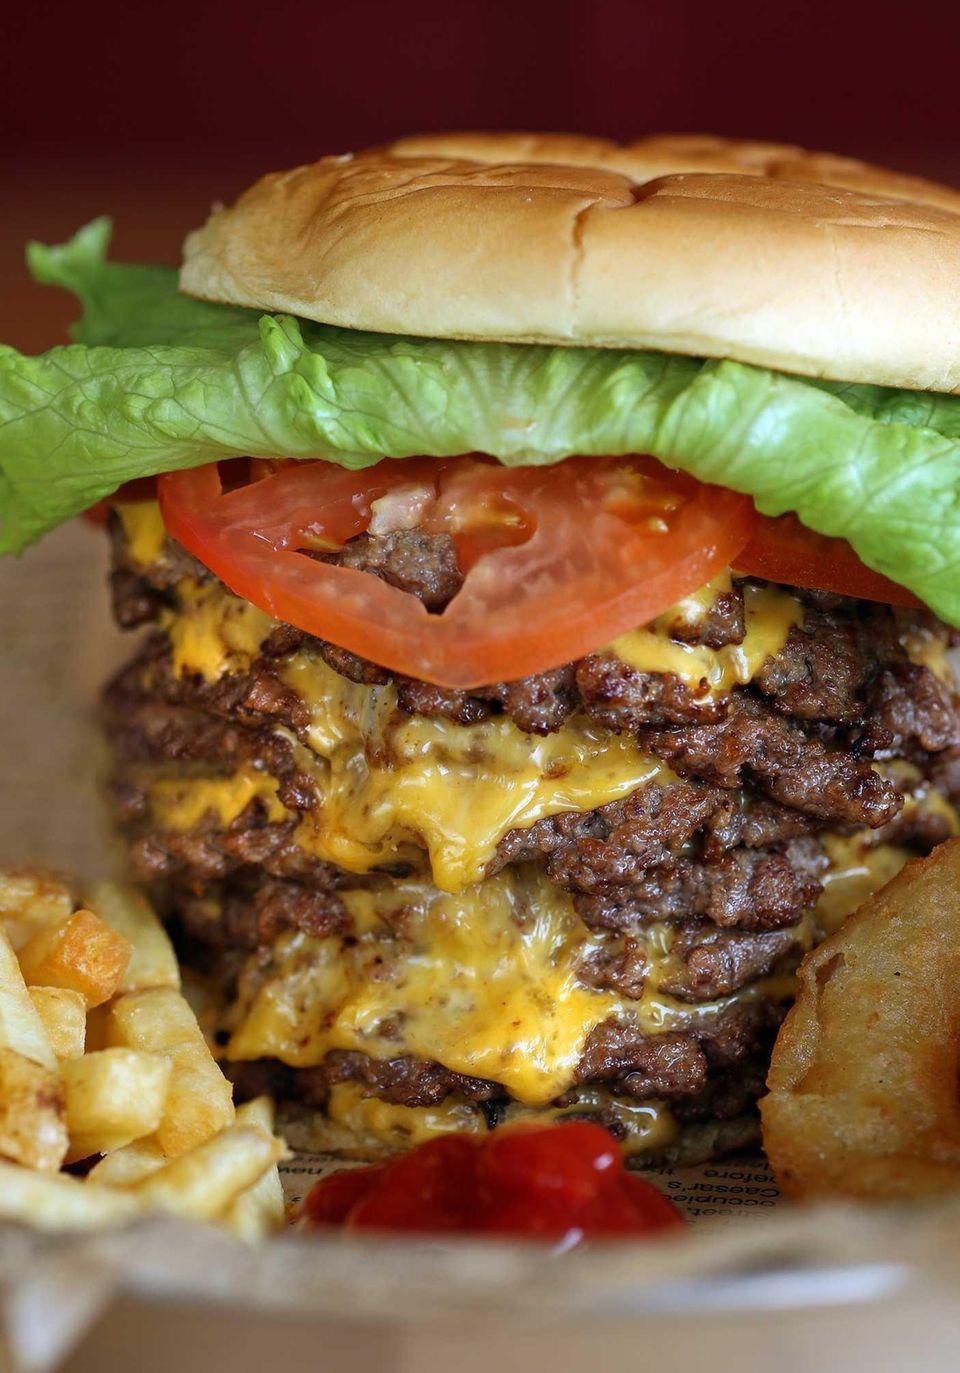 The Triple Triple 9-patty cheeseburger at Jake's Wayback